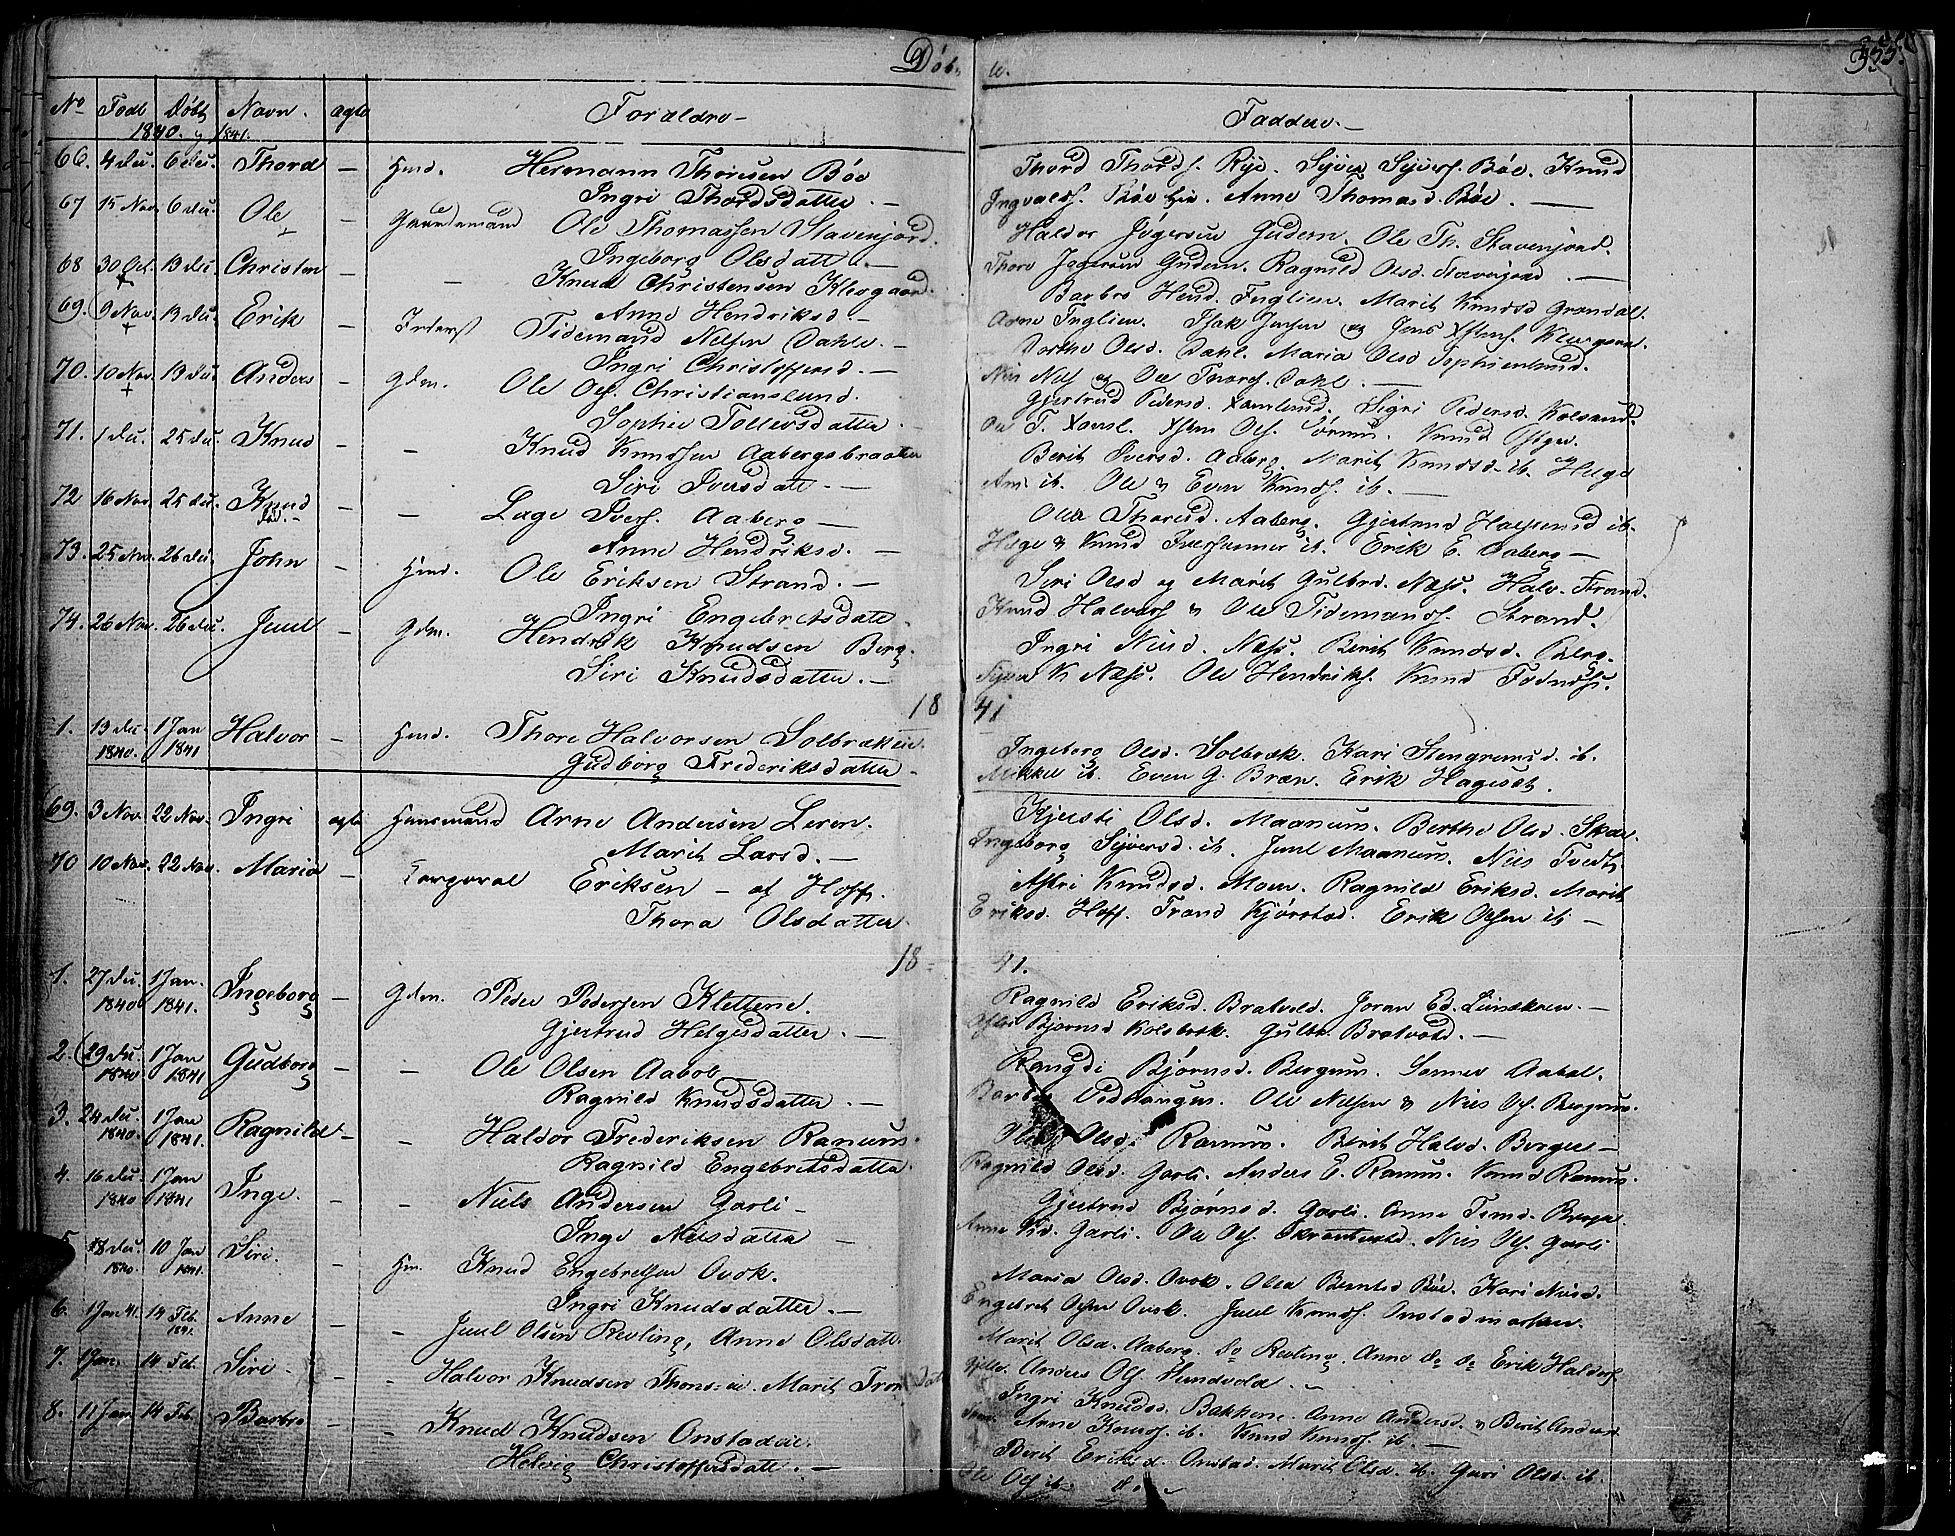 SAH, Nord-Aurdal prestekontor, Ministerialbok nr. 3, 1828-1841, s. 354